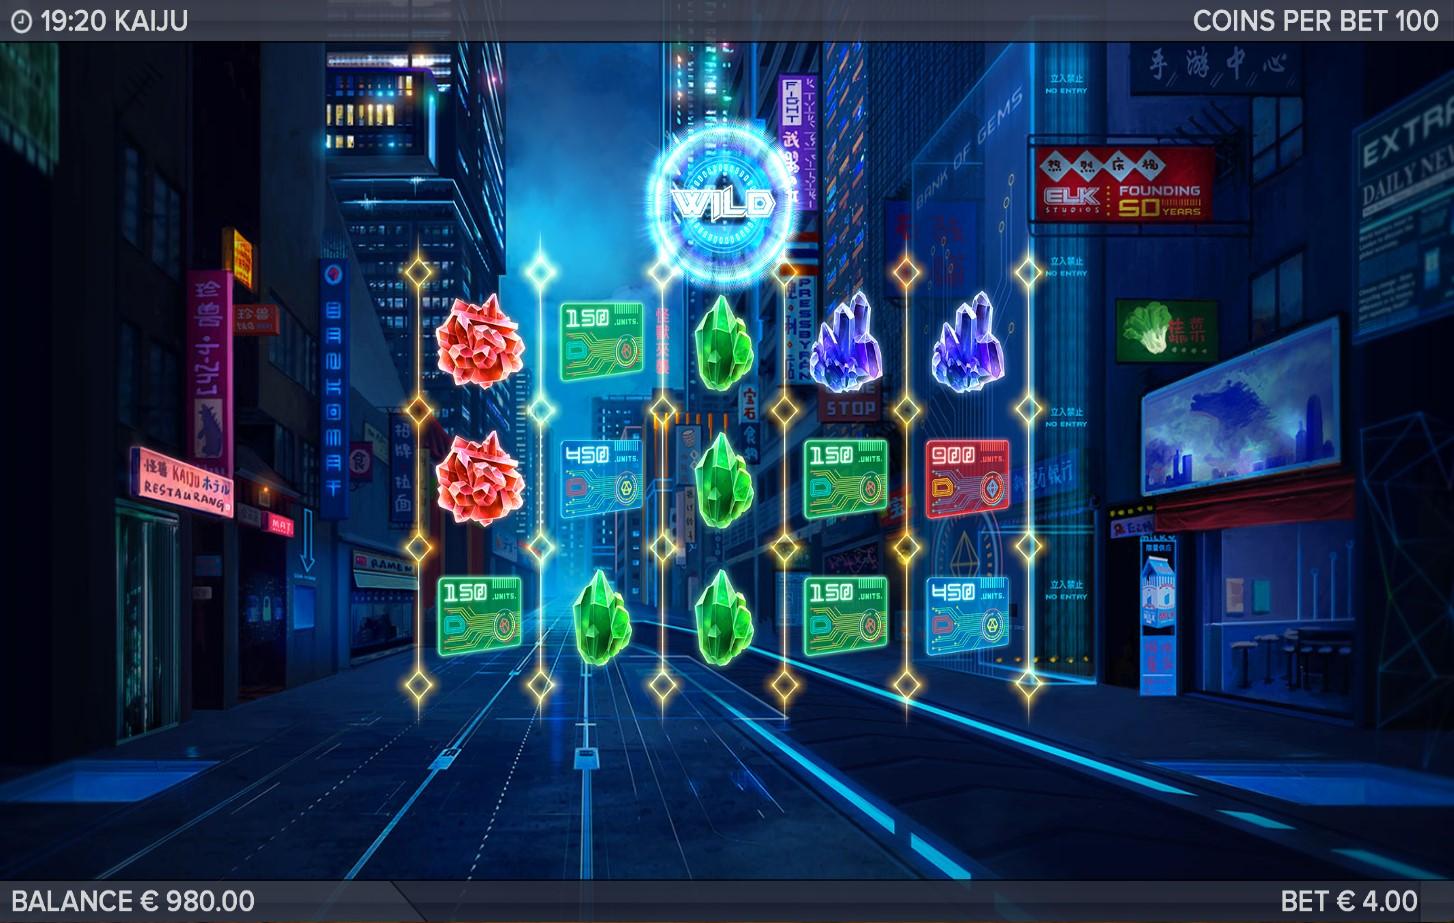 Unusual reel format in PlayOJO's Kaiju online slot game